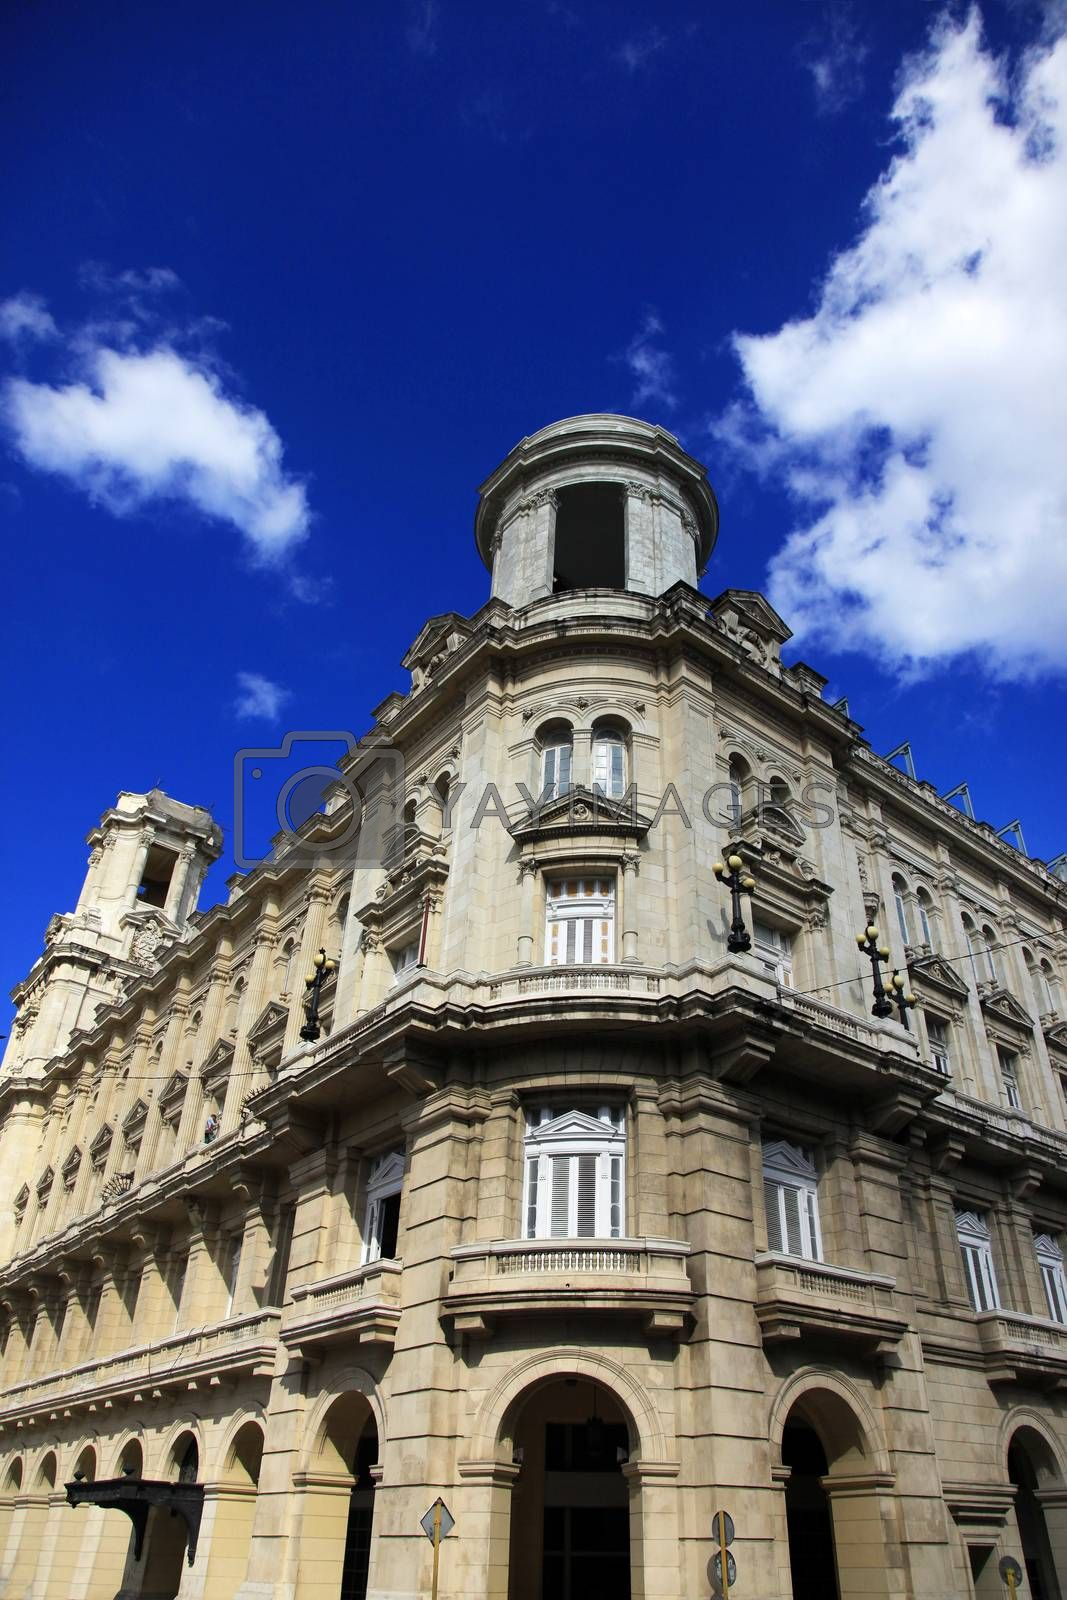 Beautiful facade of a building in the old Havana, Cuba